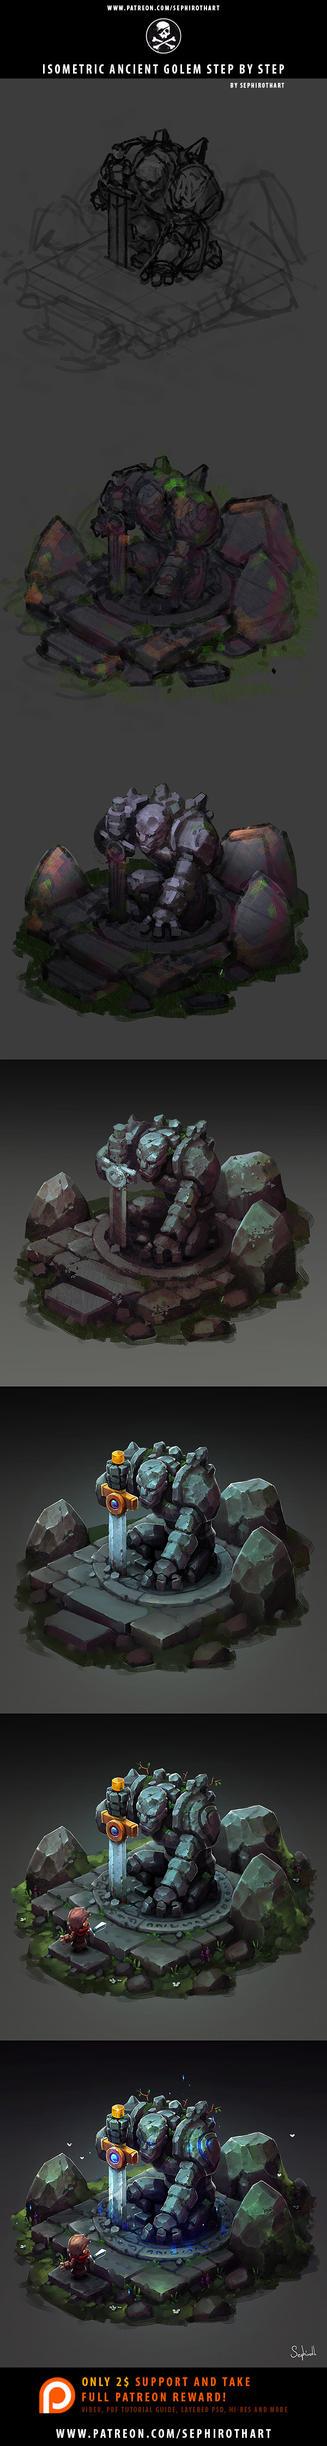 Isometric Golem Step-by-Step by Sephiroth-Art